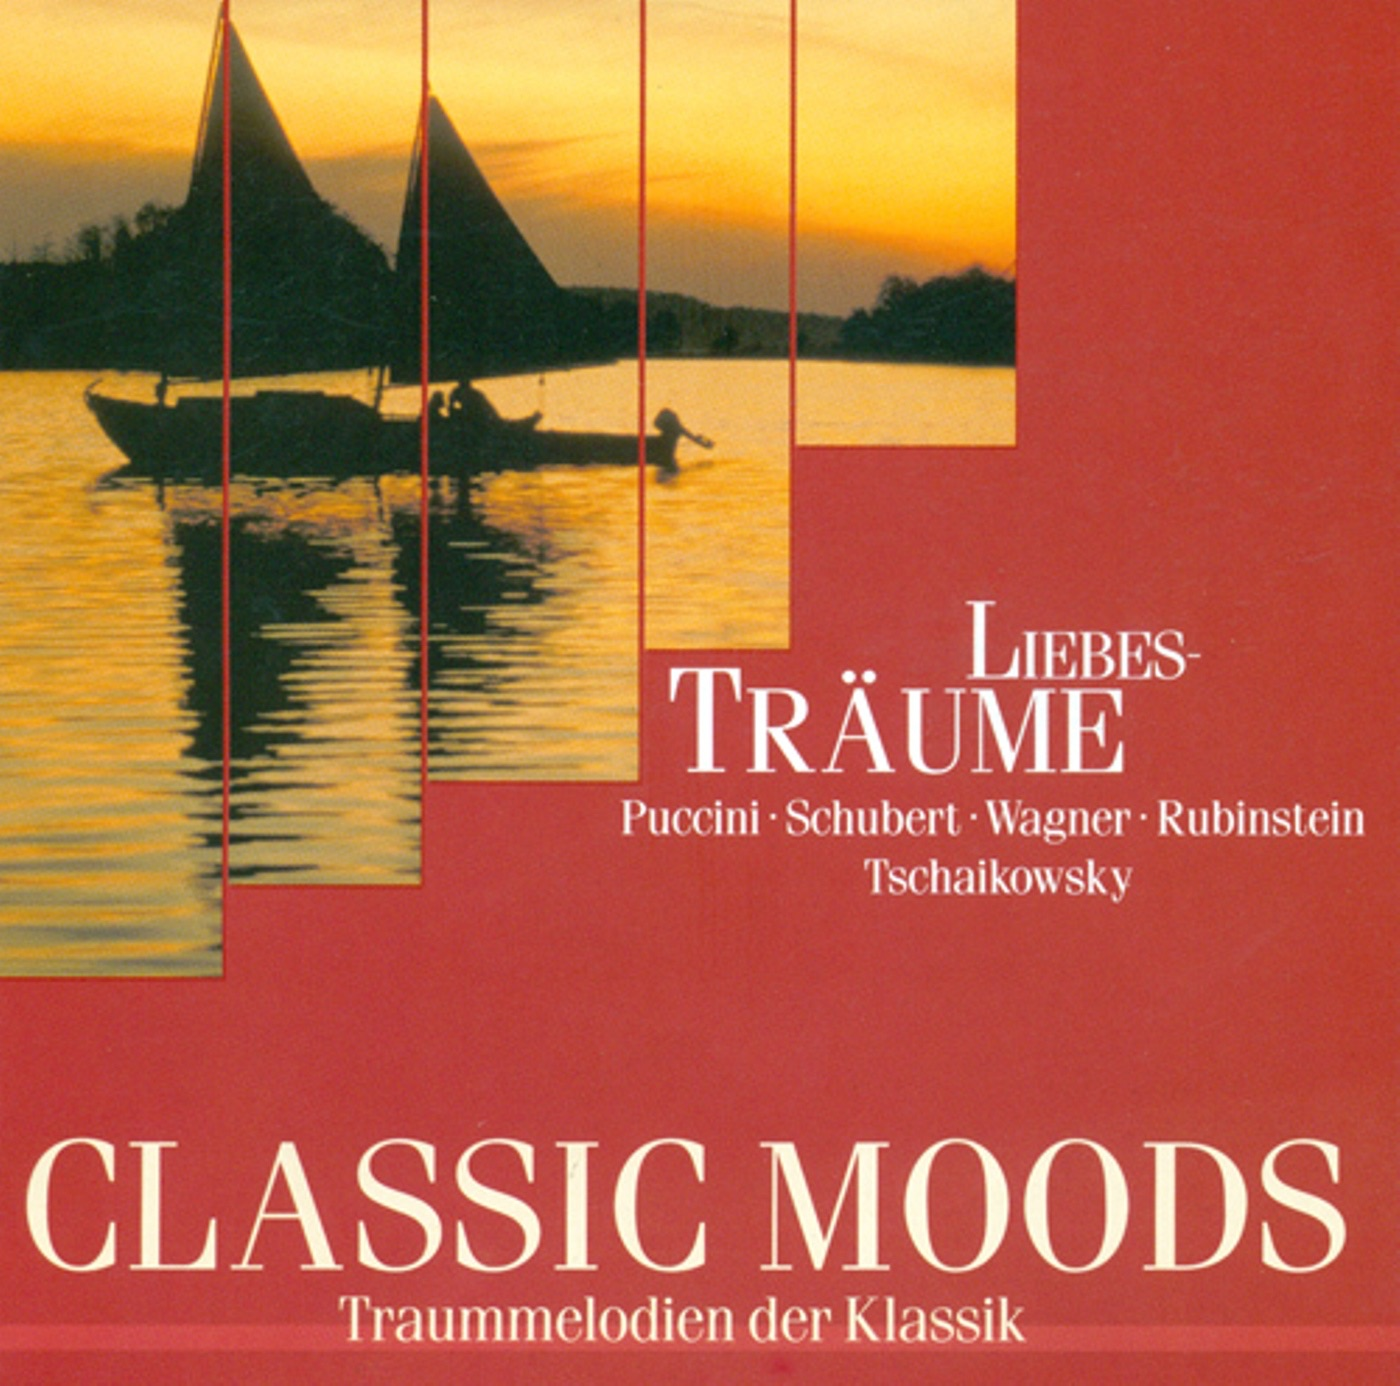 Classic Moods - Puccini, G. - Schubert, F. - Wagner, R. - Rubinstein, A. - Tchaikovsky, P.I.